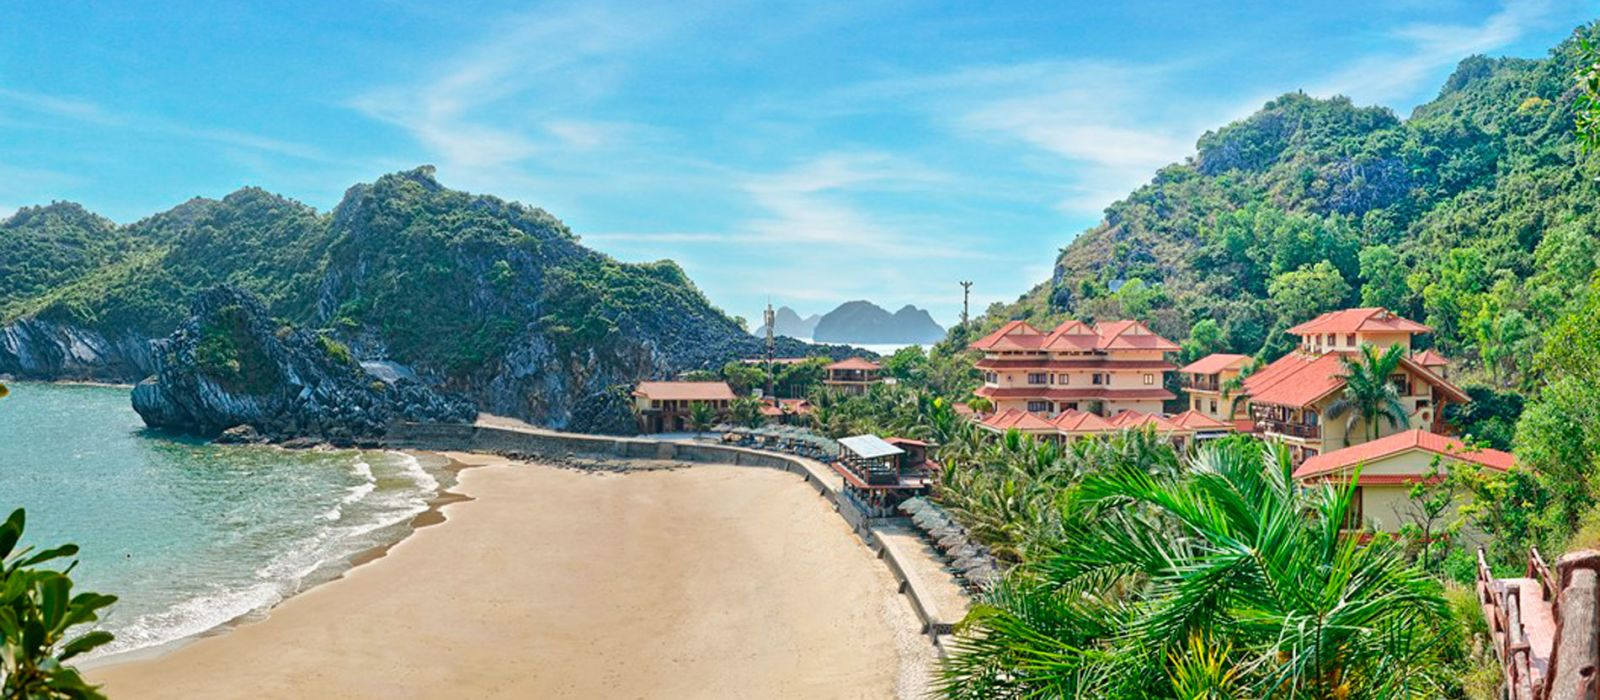 Hotel Sunrise Resort (Cat Ba Island) Vietnam